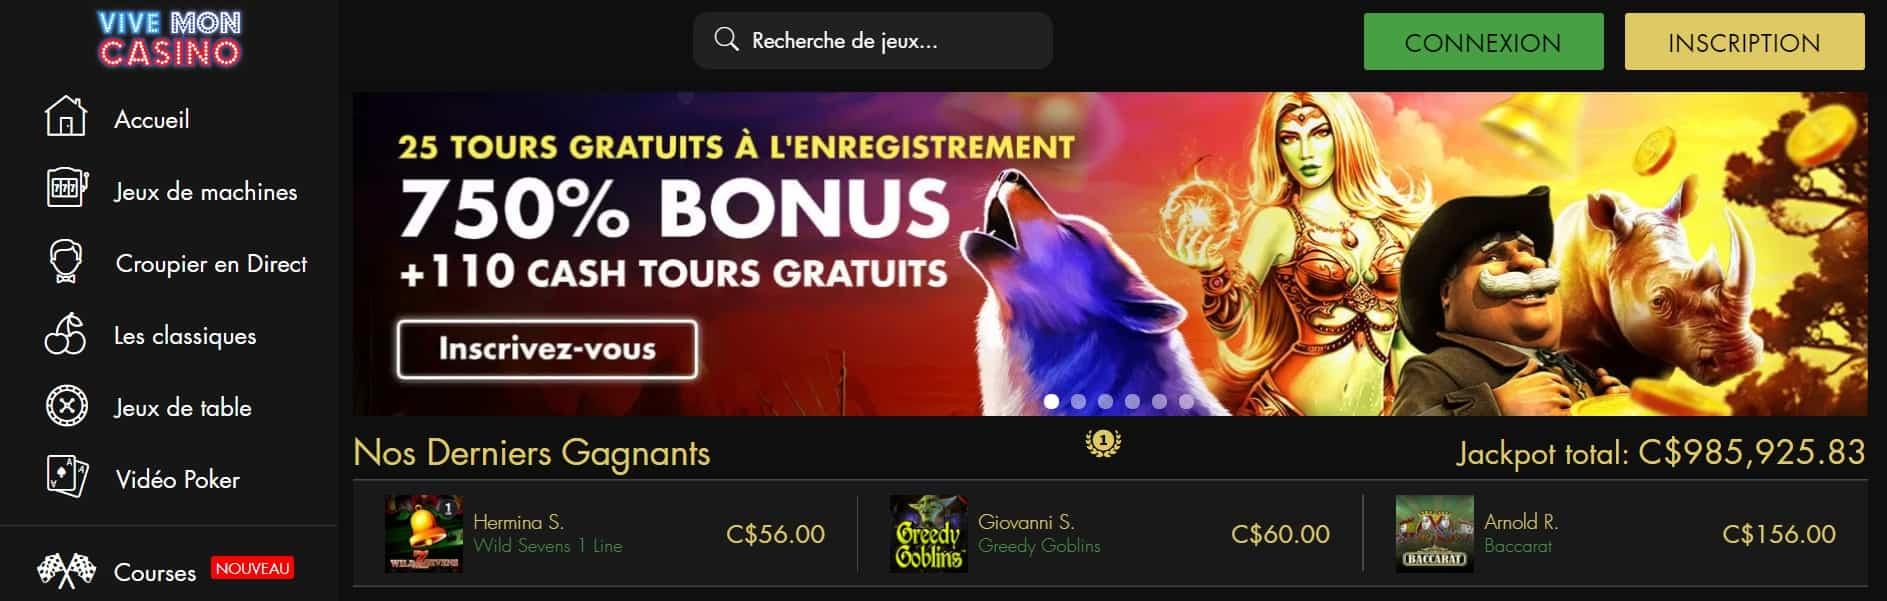 10 euros gratuits